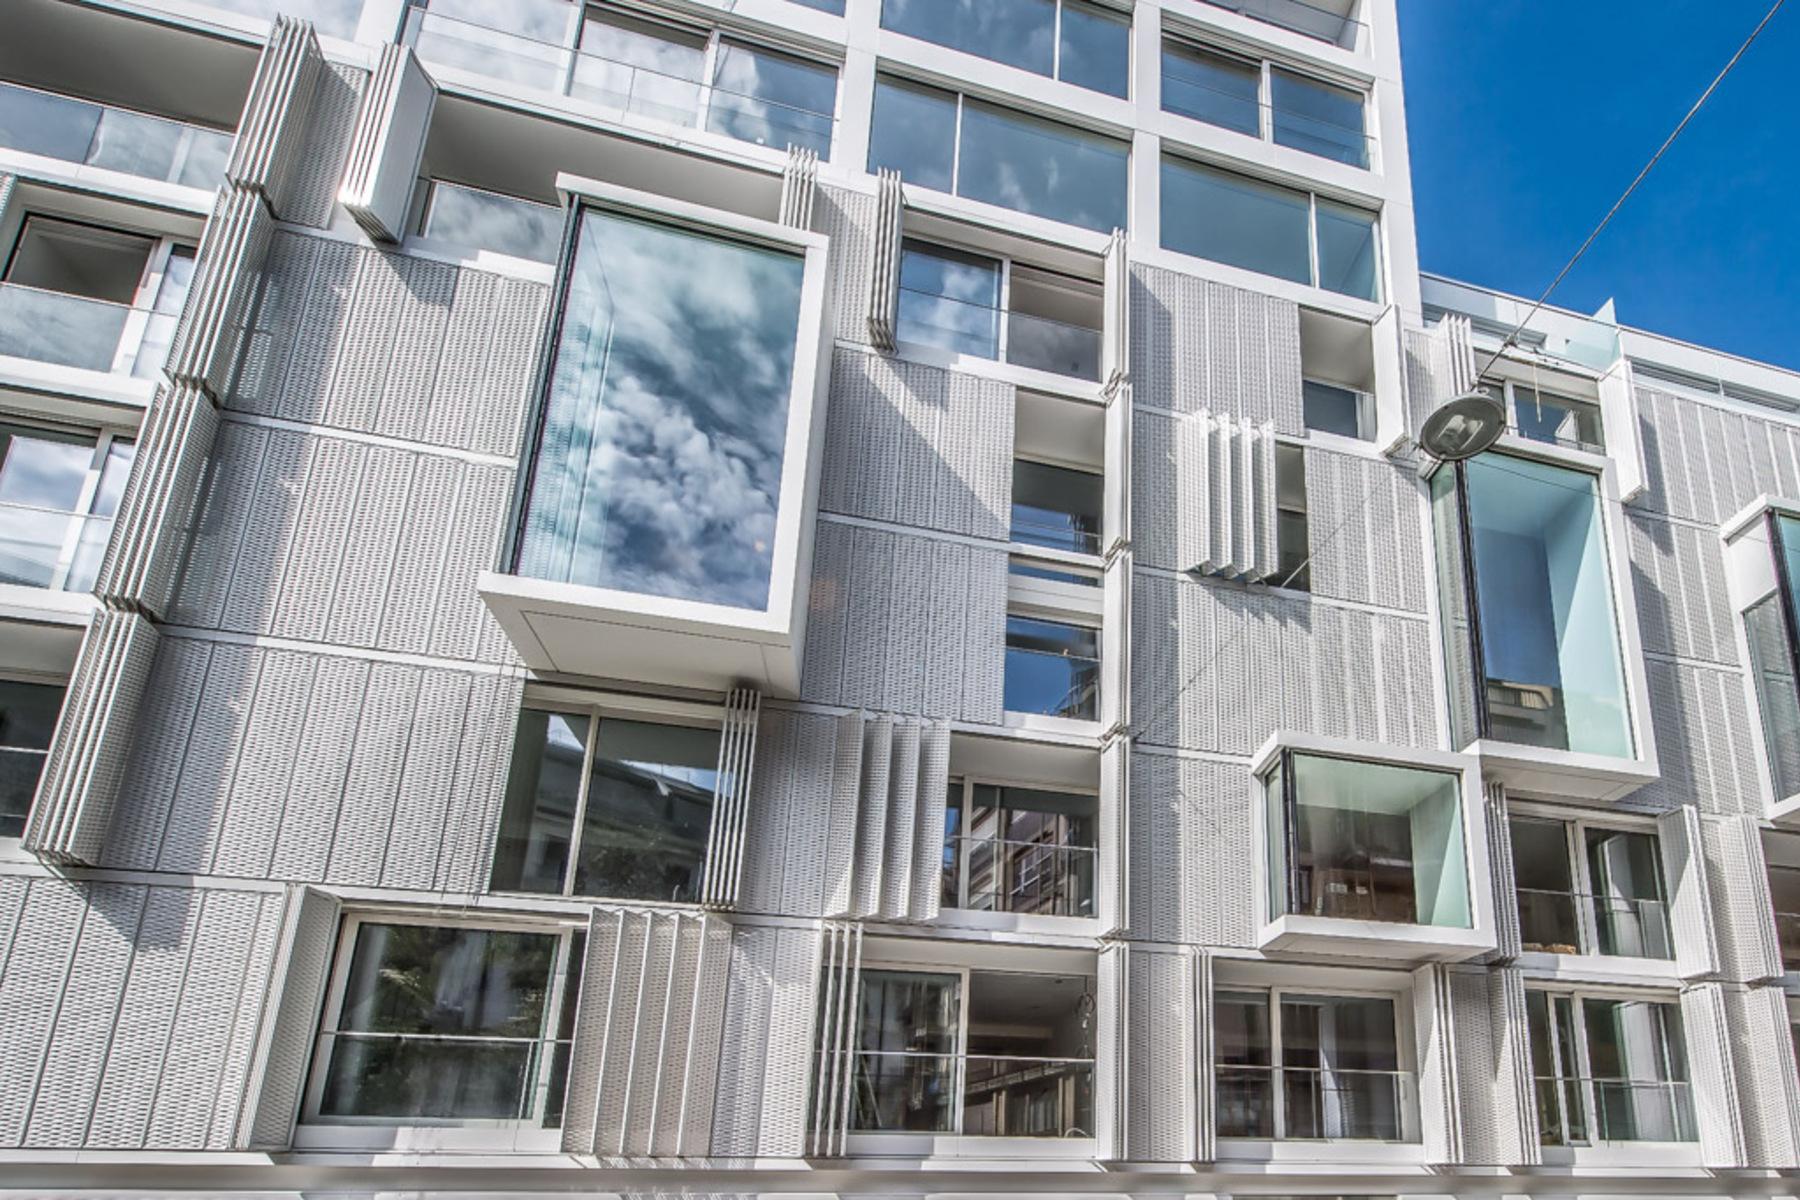 Piso por un Venta en For sale, Condominium apartment, 1201 Genève, Réf 3753 Geneva, Geneve, 1201 Suiza